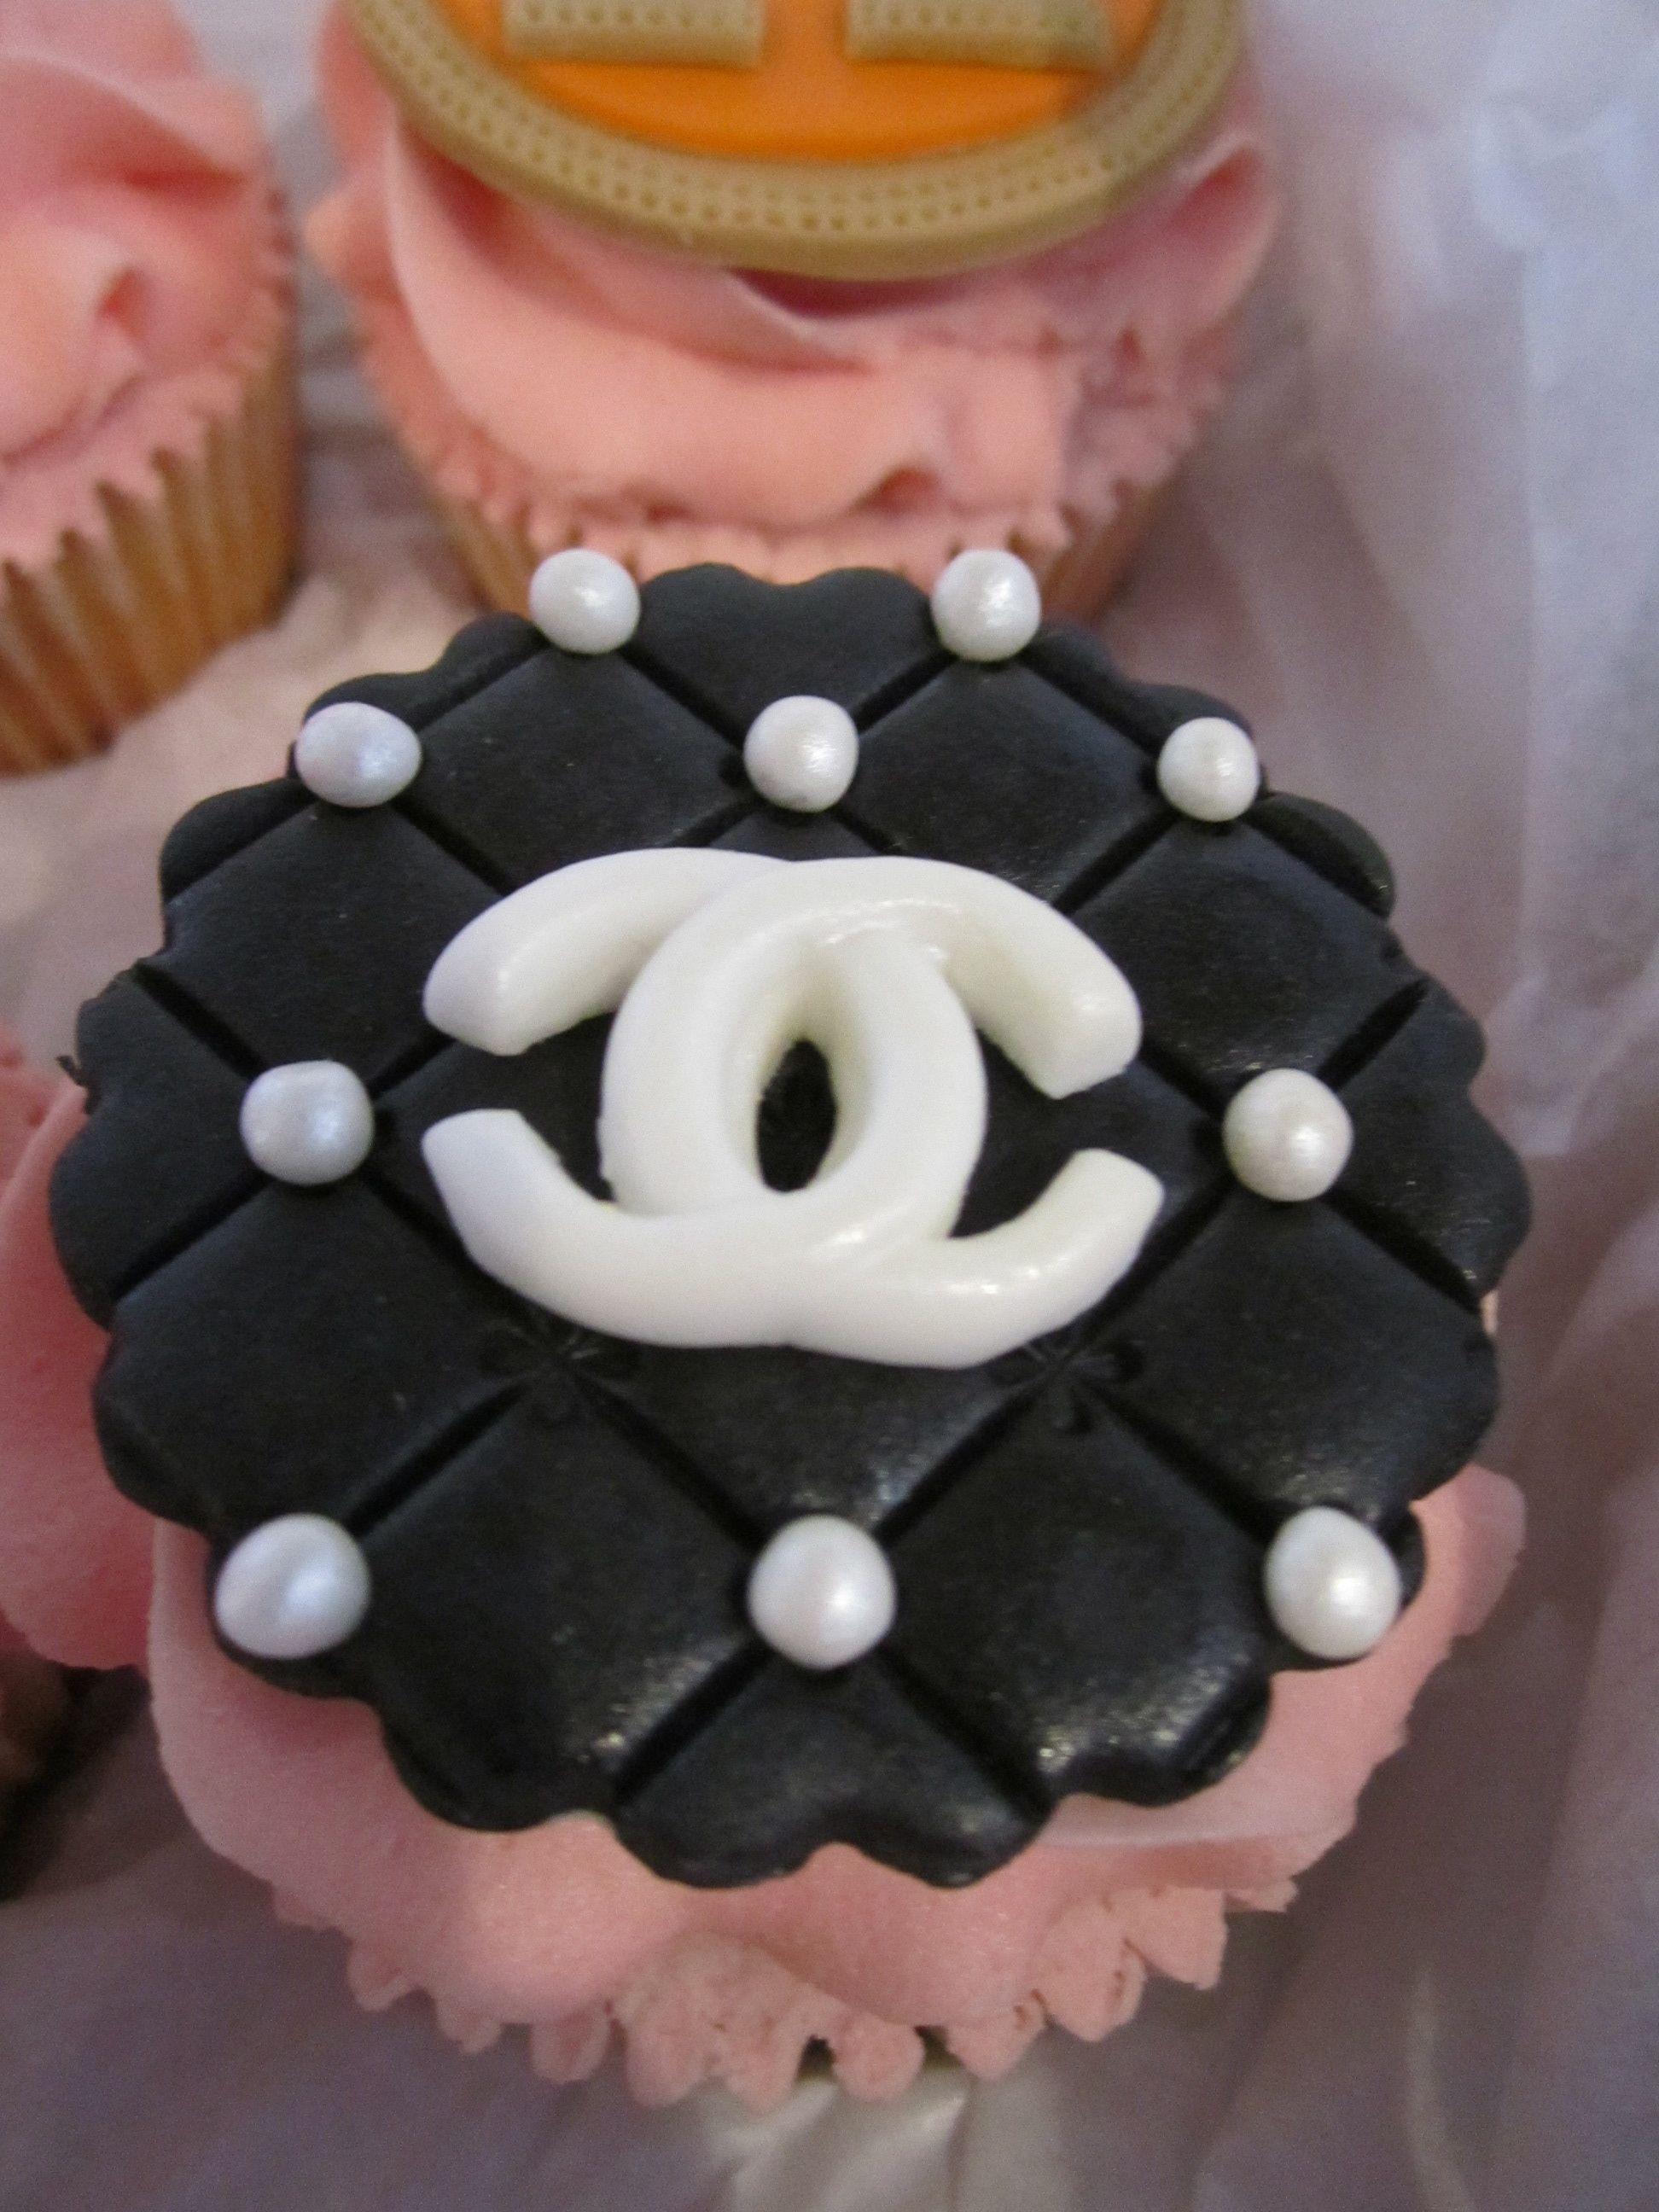 Designer Handbag Cupcake Topper In The Style Of Chanel